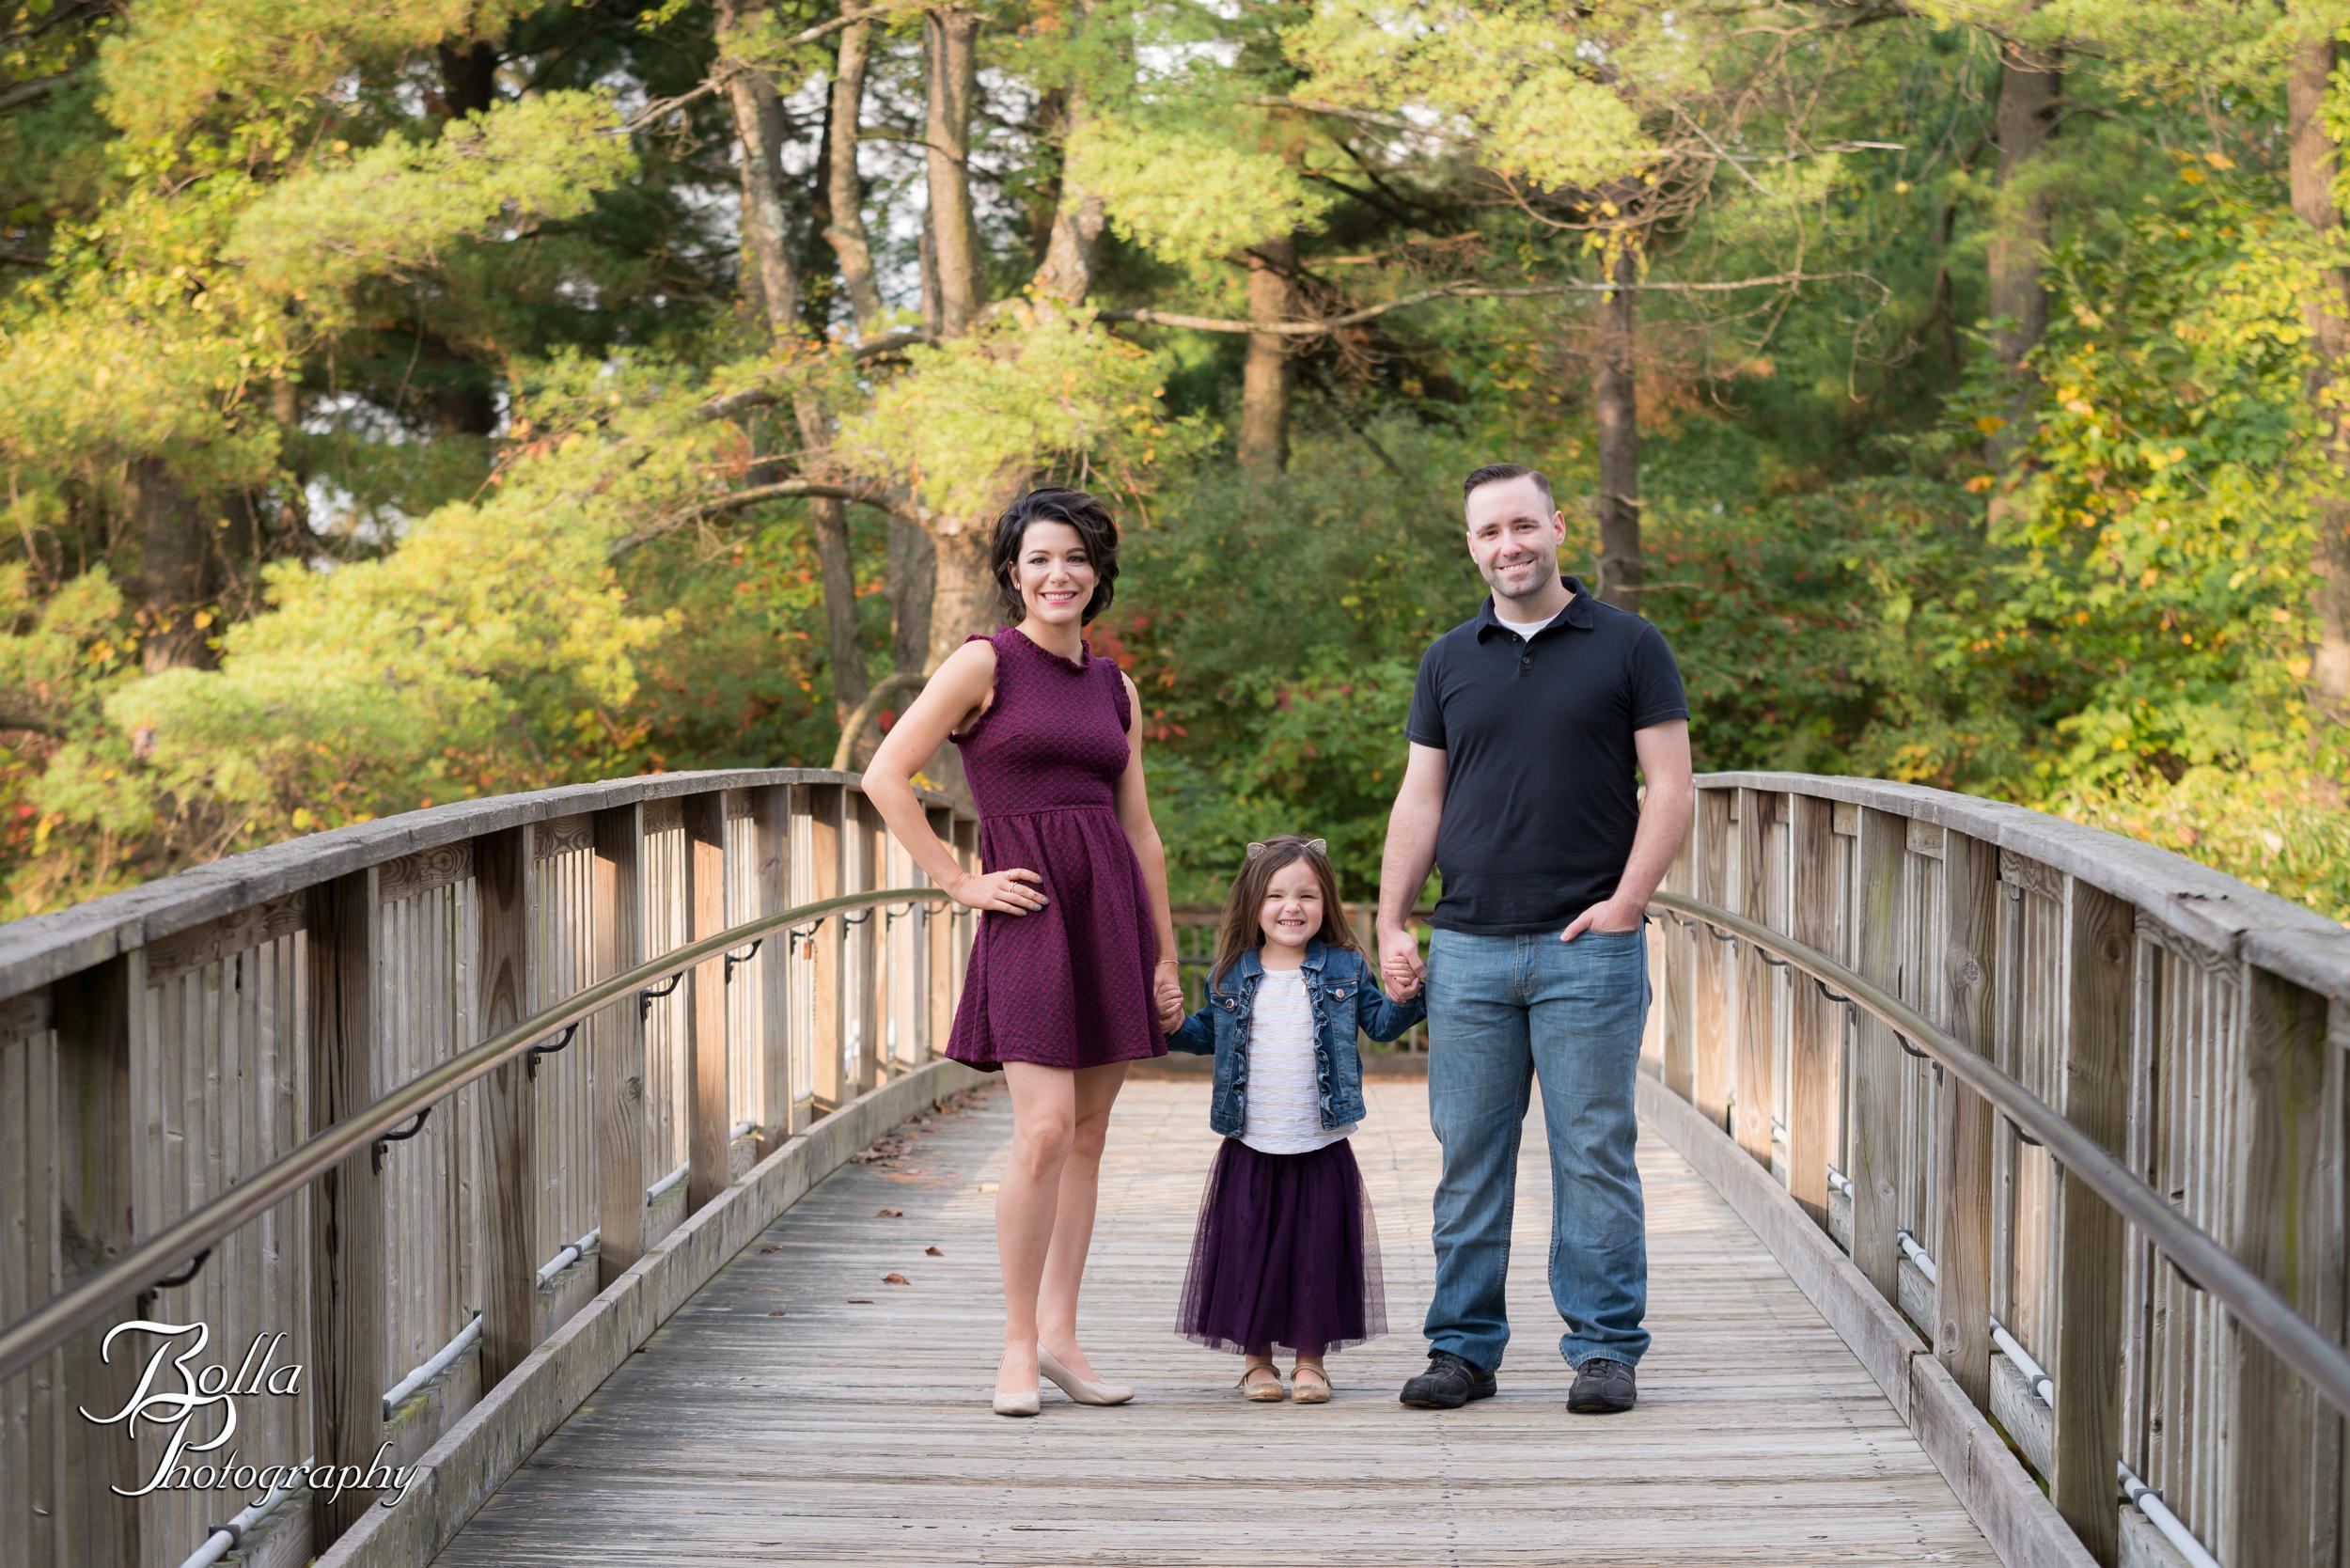 20171014_Bolla photography edwardsville wedding newborn baby photographer st louis weddings babies-0001.jpg